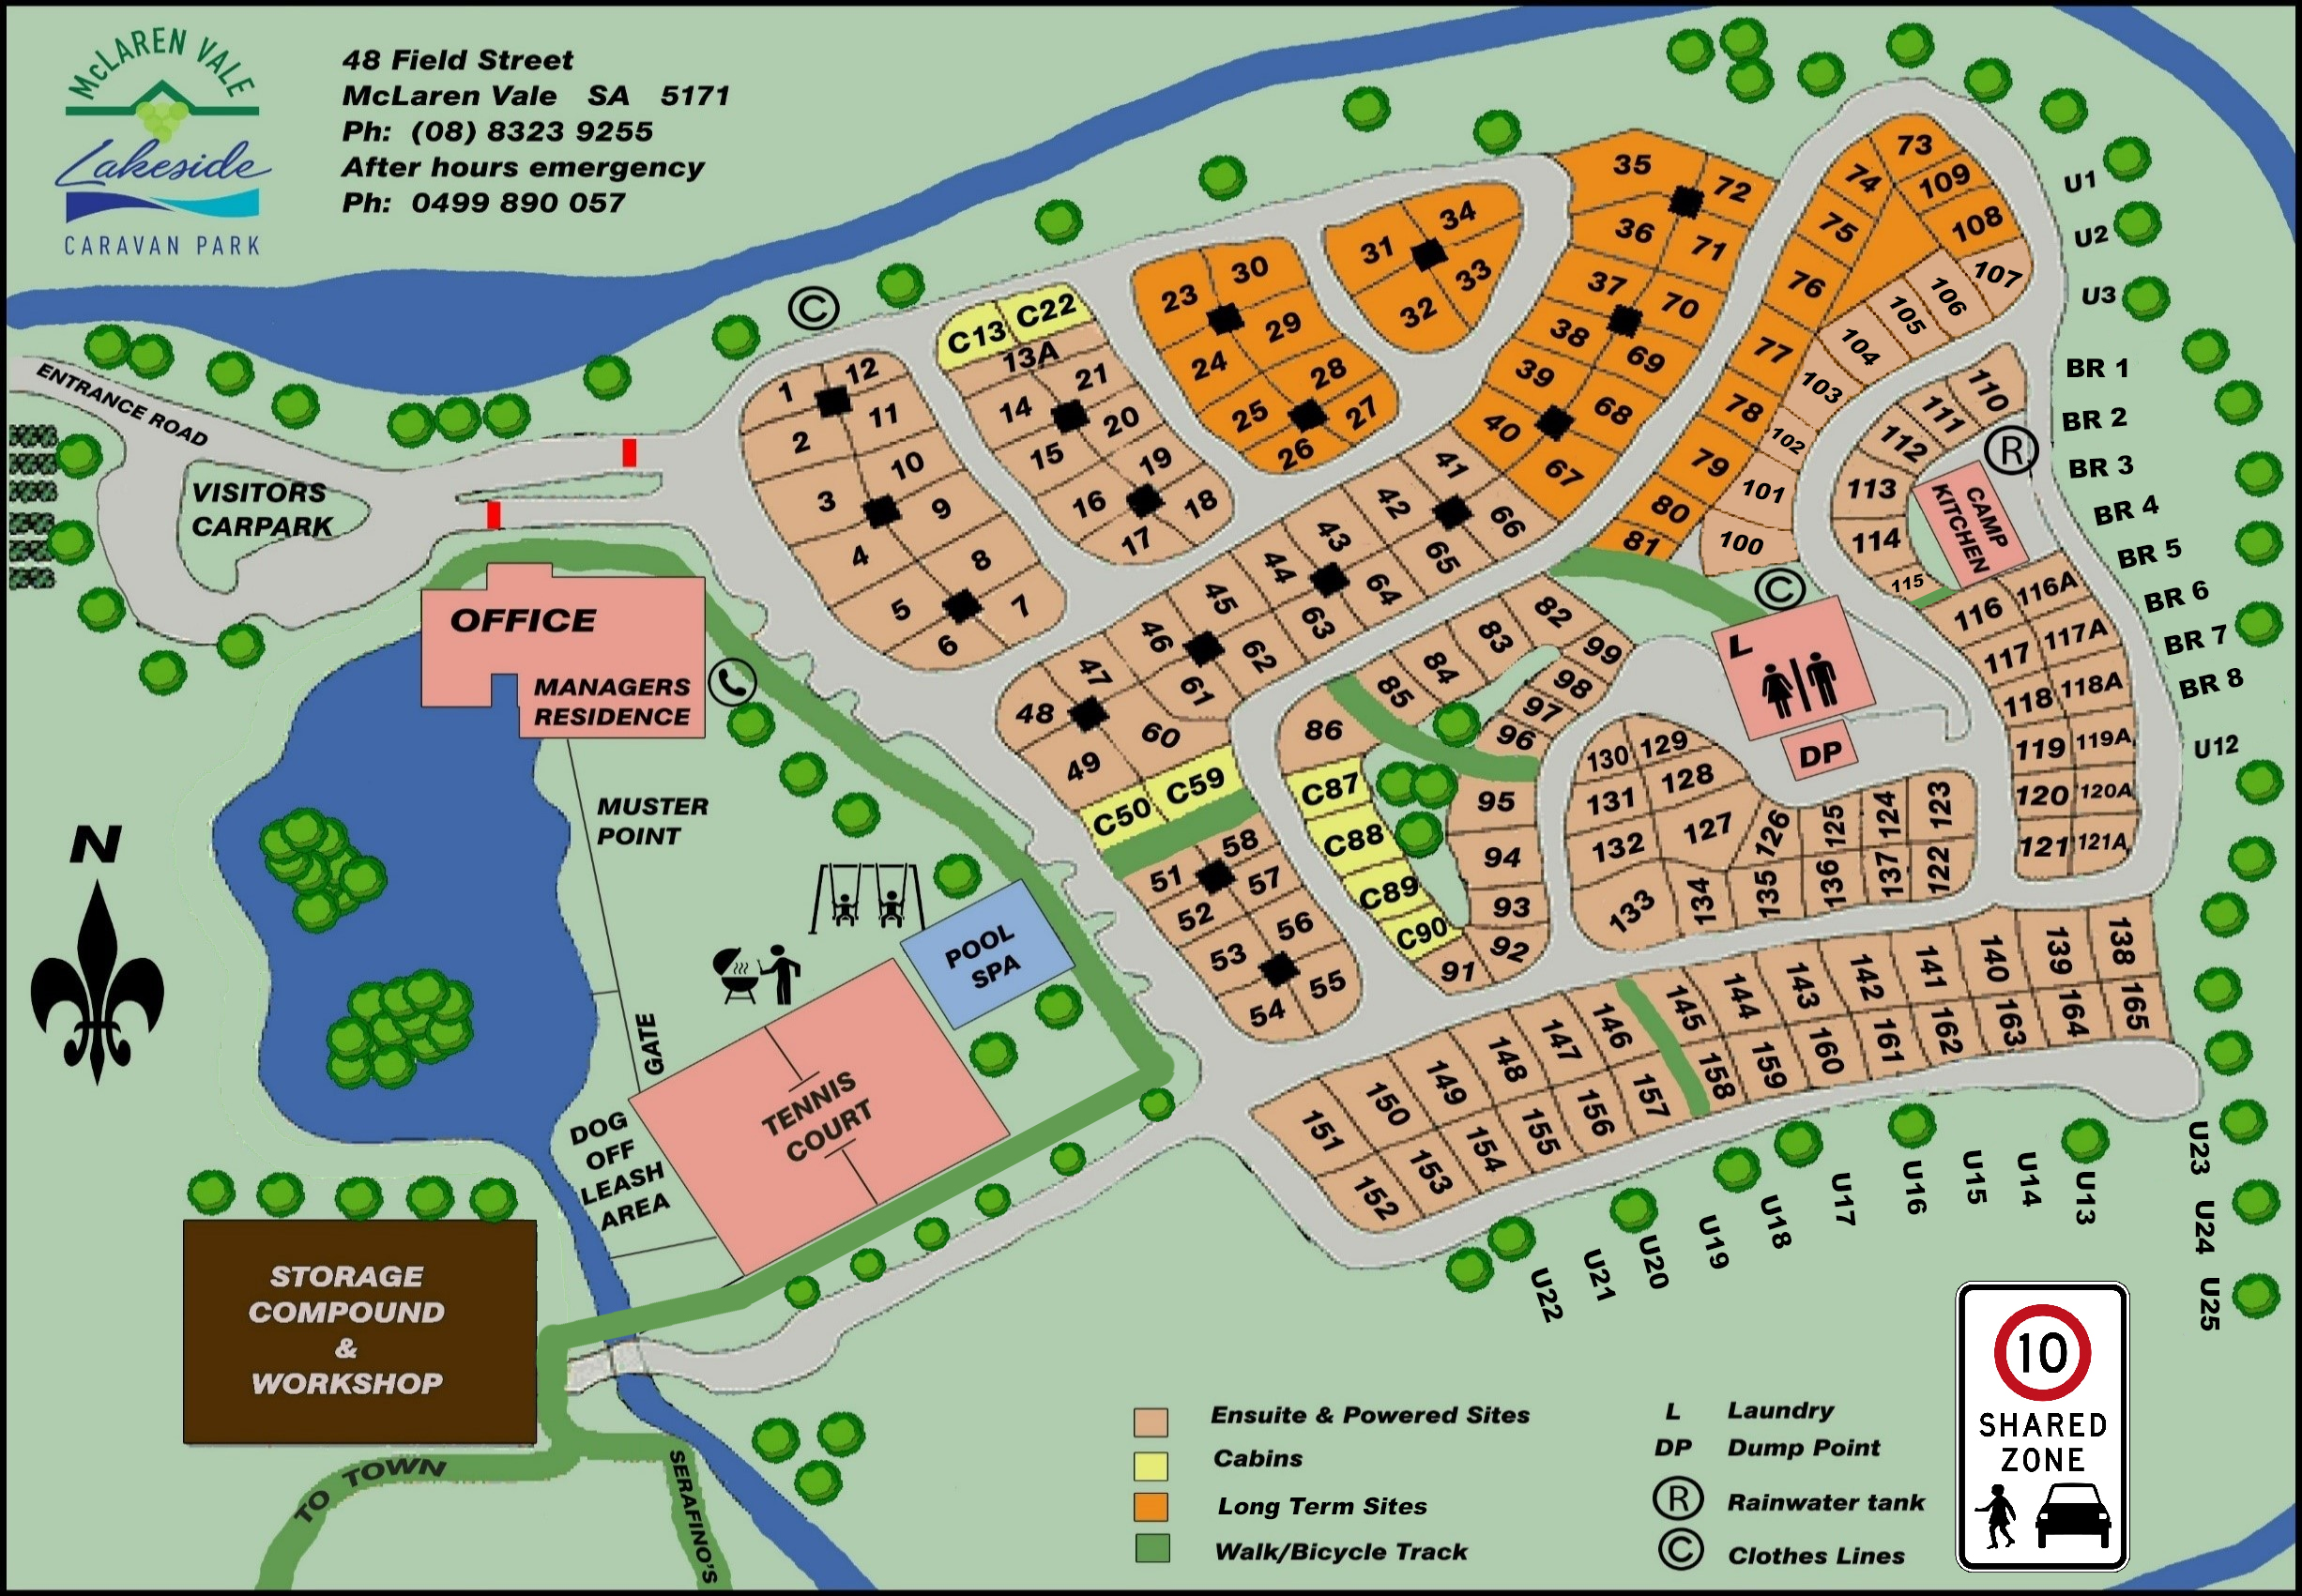 MVLCP MAP 281019